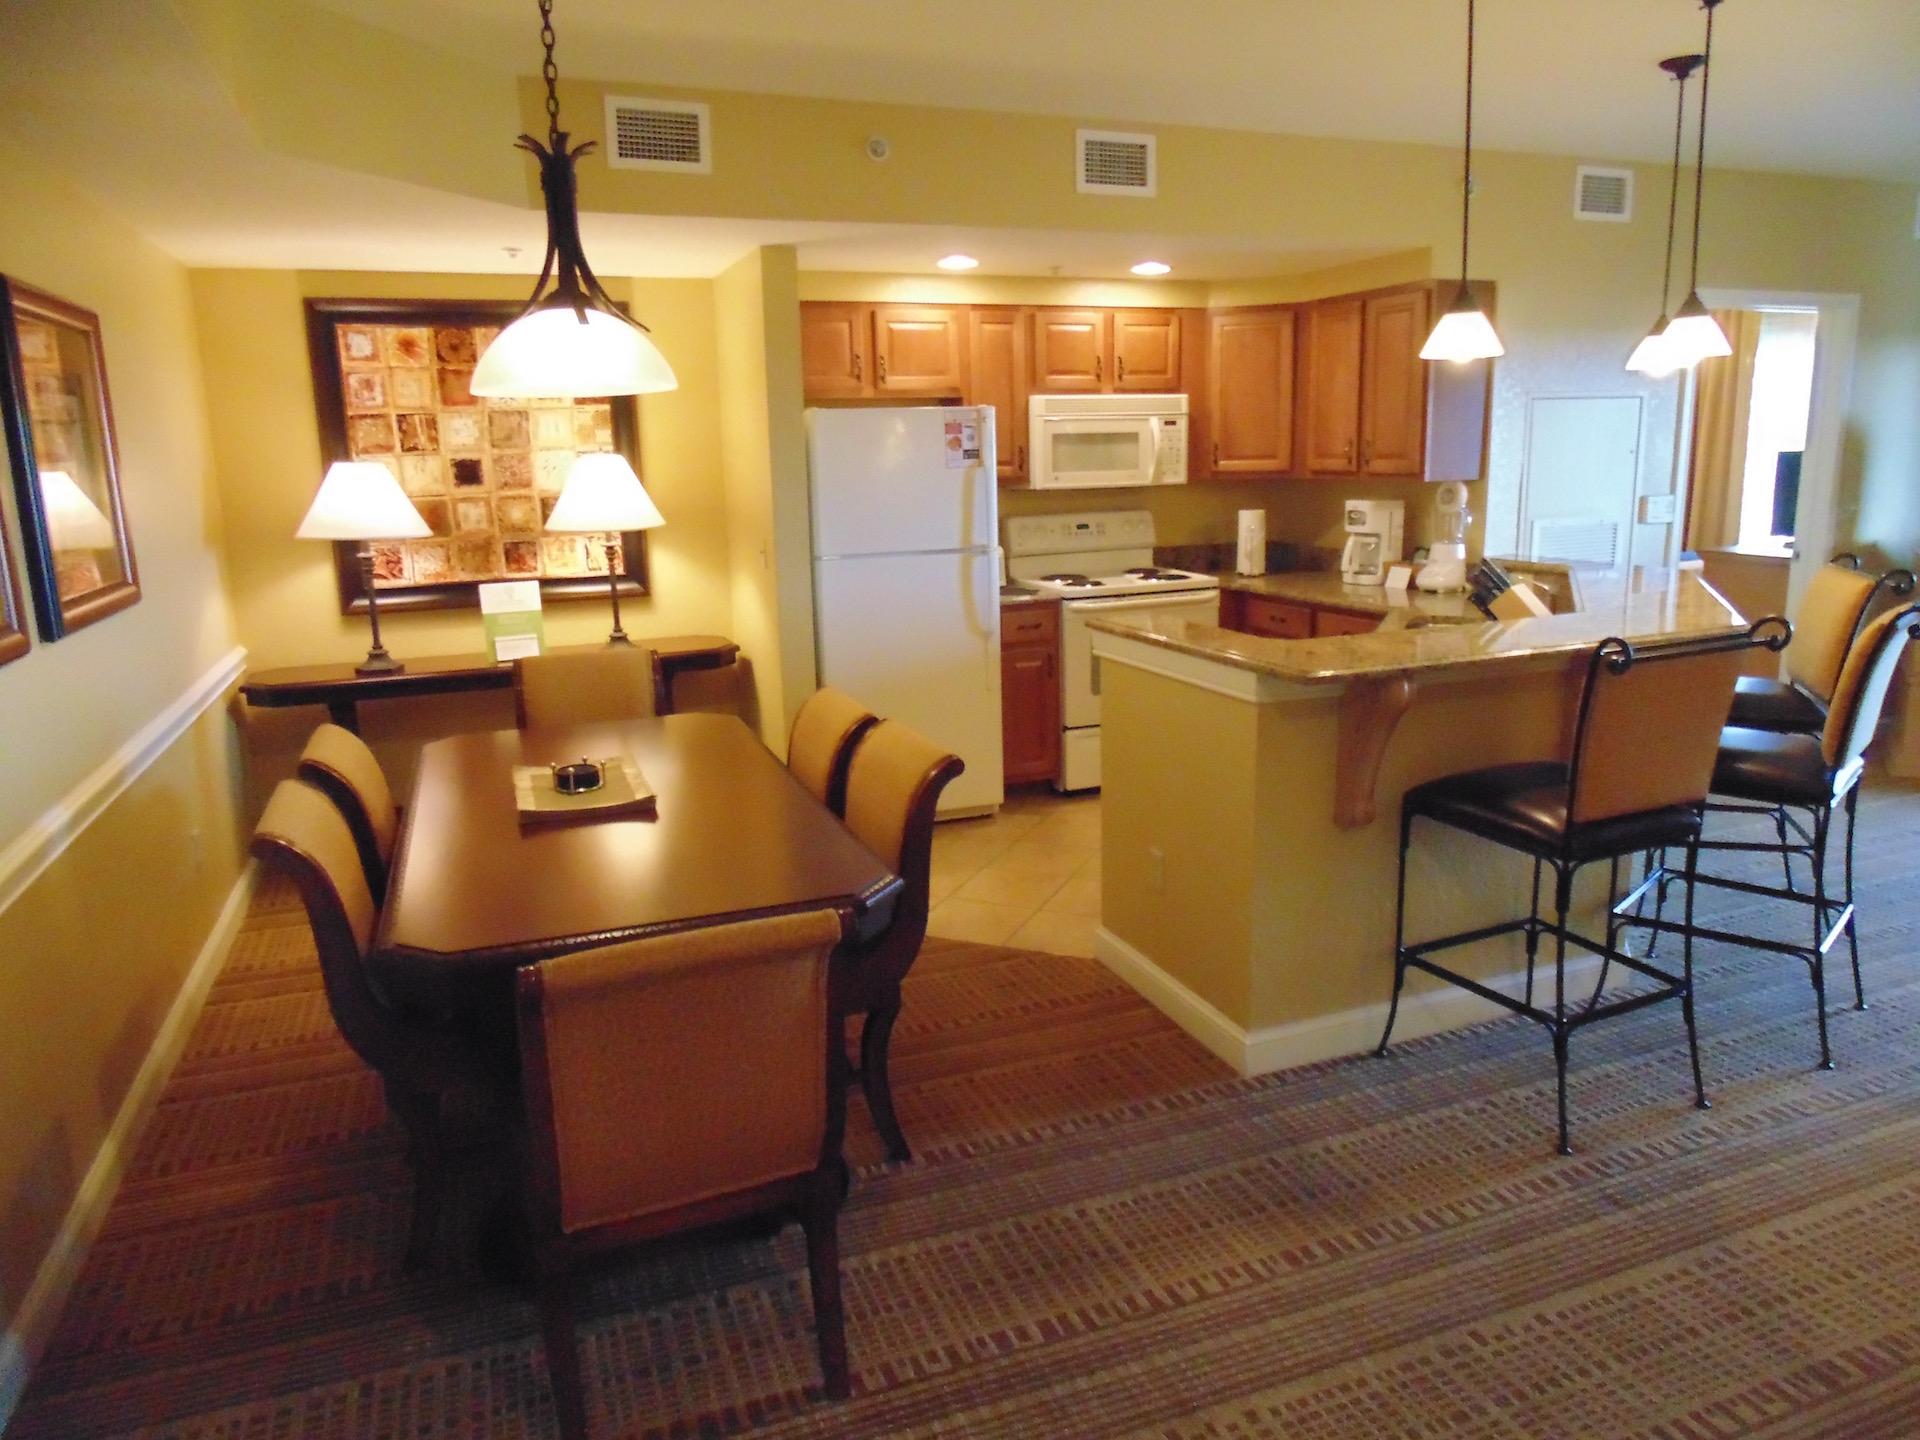 Wyndham Bonnet Creek ツ 1 Bedroom Deluxe Condominiums For Rent In Orlando Florida United States